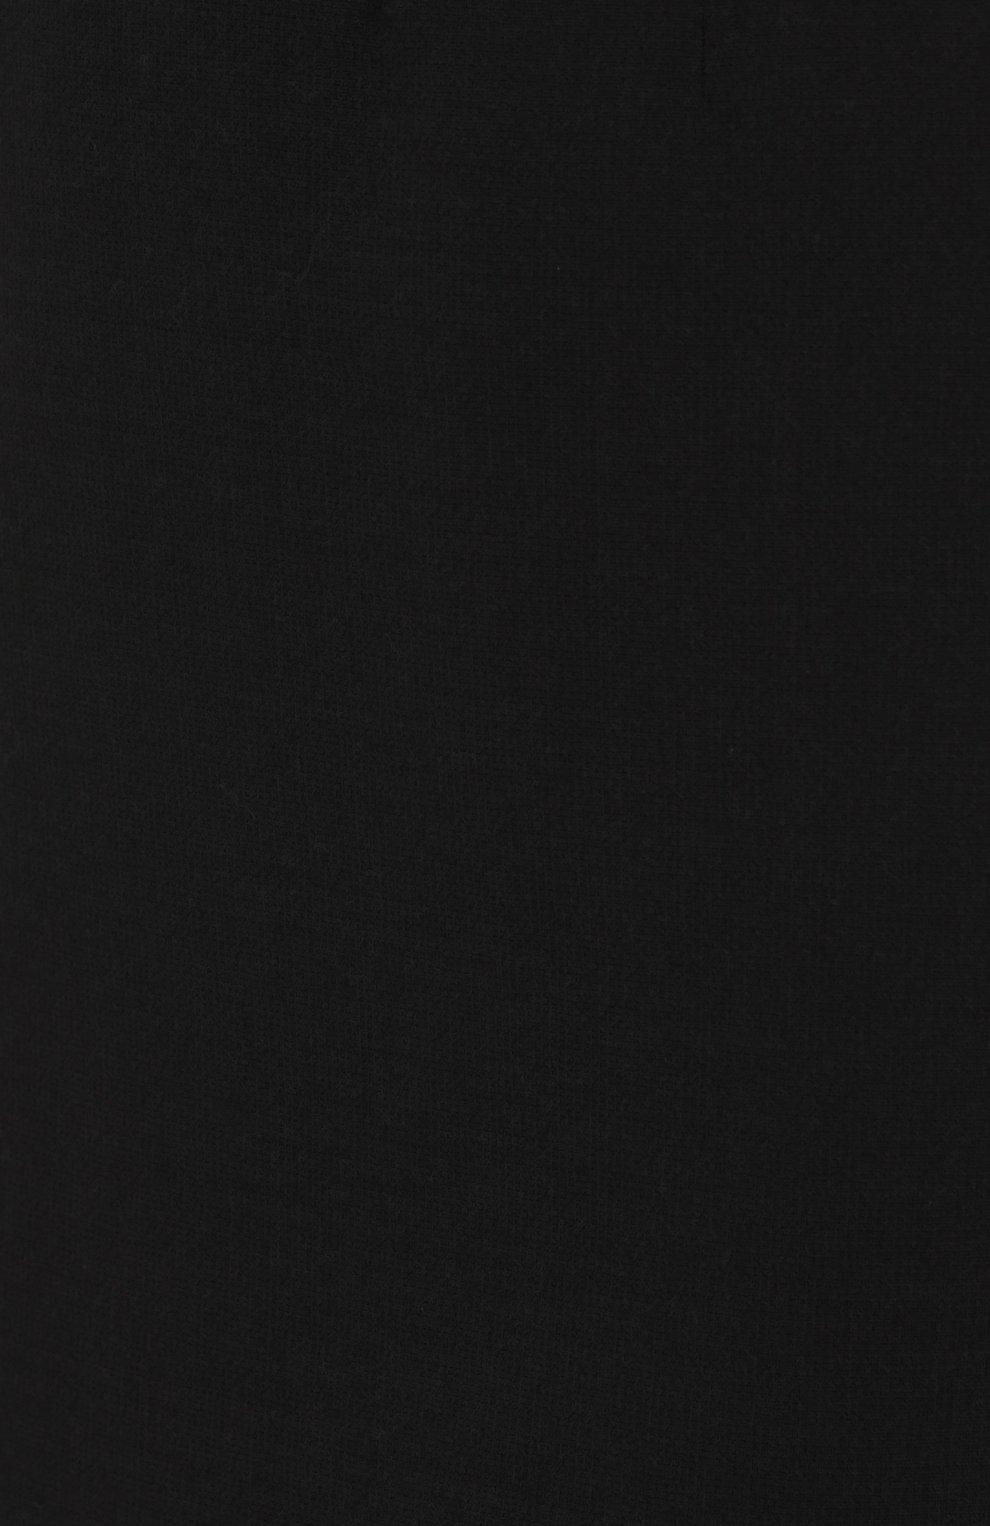 Мини-юбка с широким поясом Dolce & Gabbana черная | Фото №5